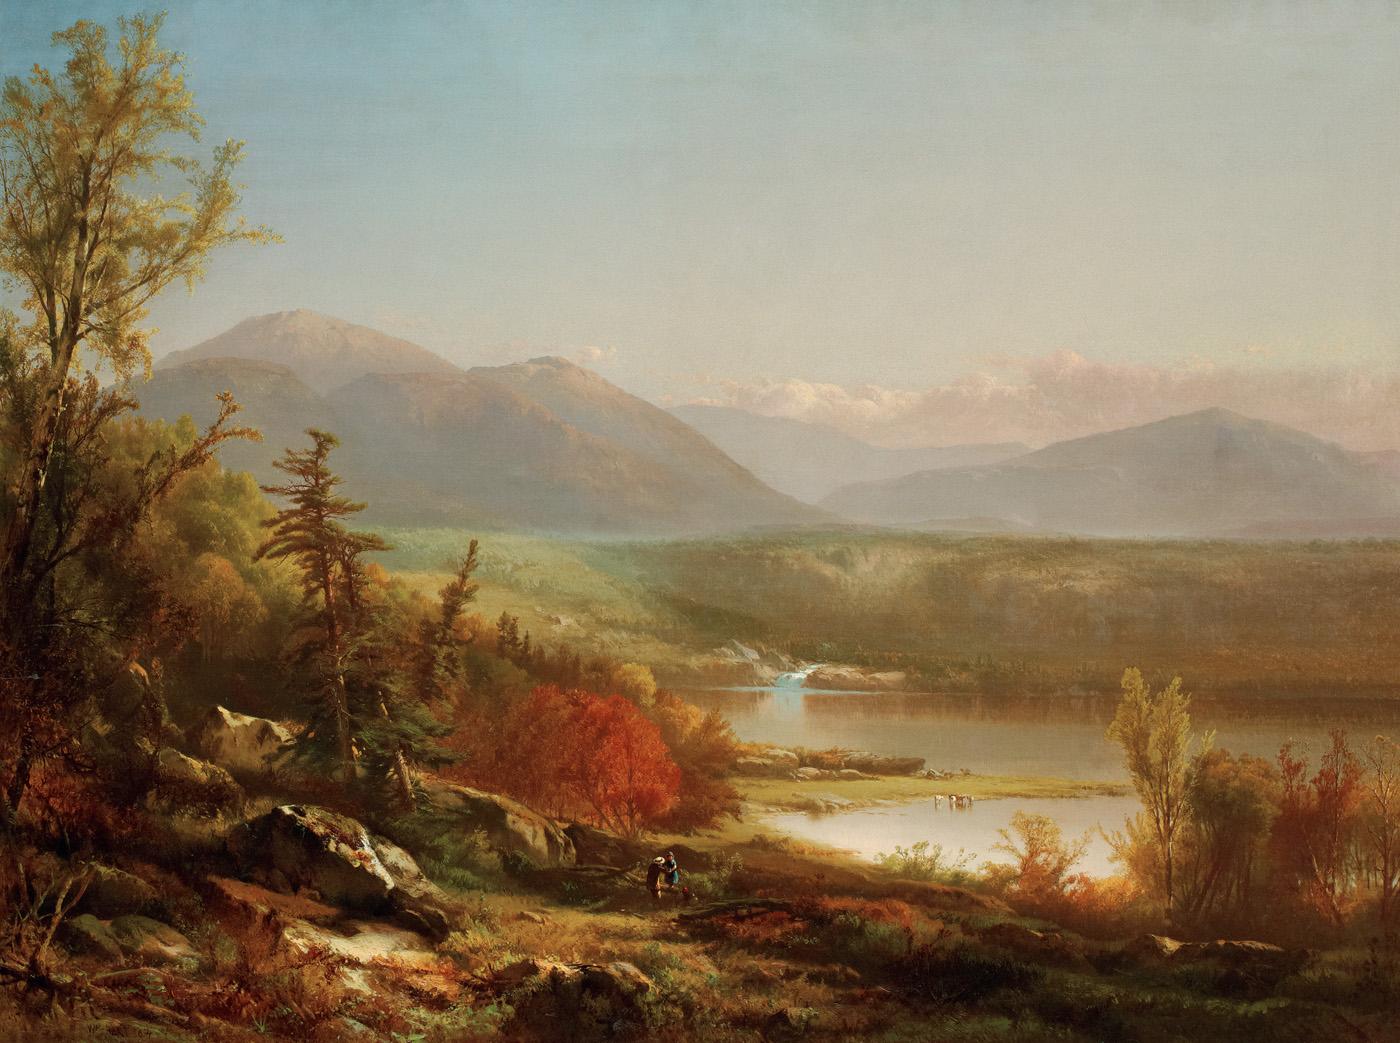 Along the Winding Way, 1864